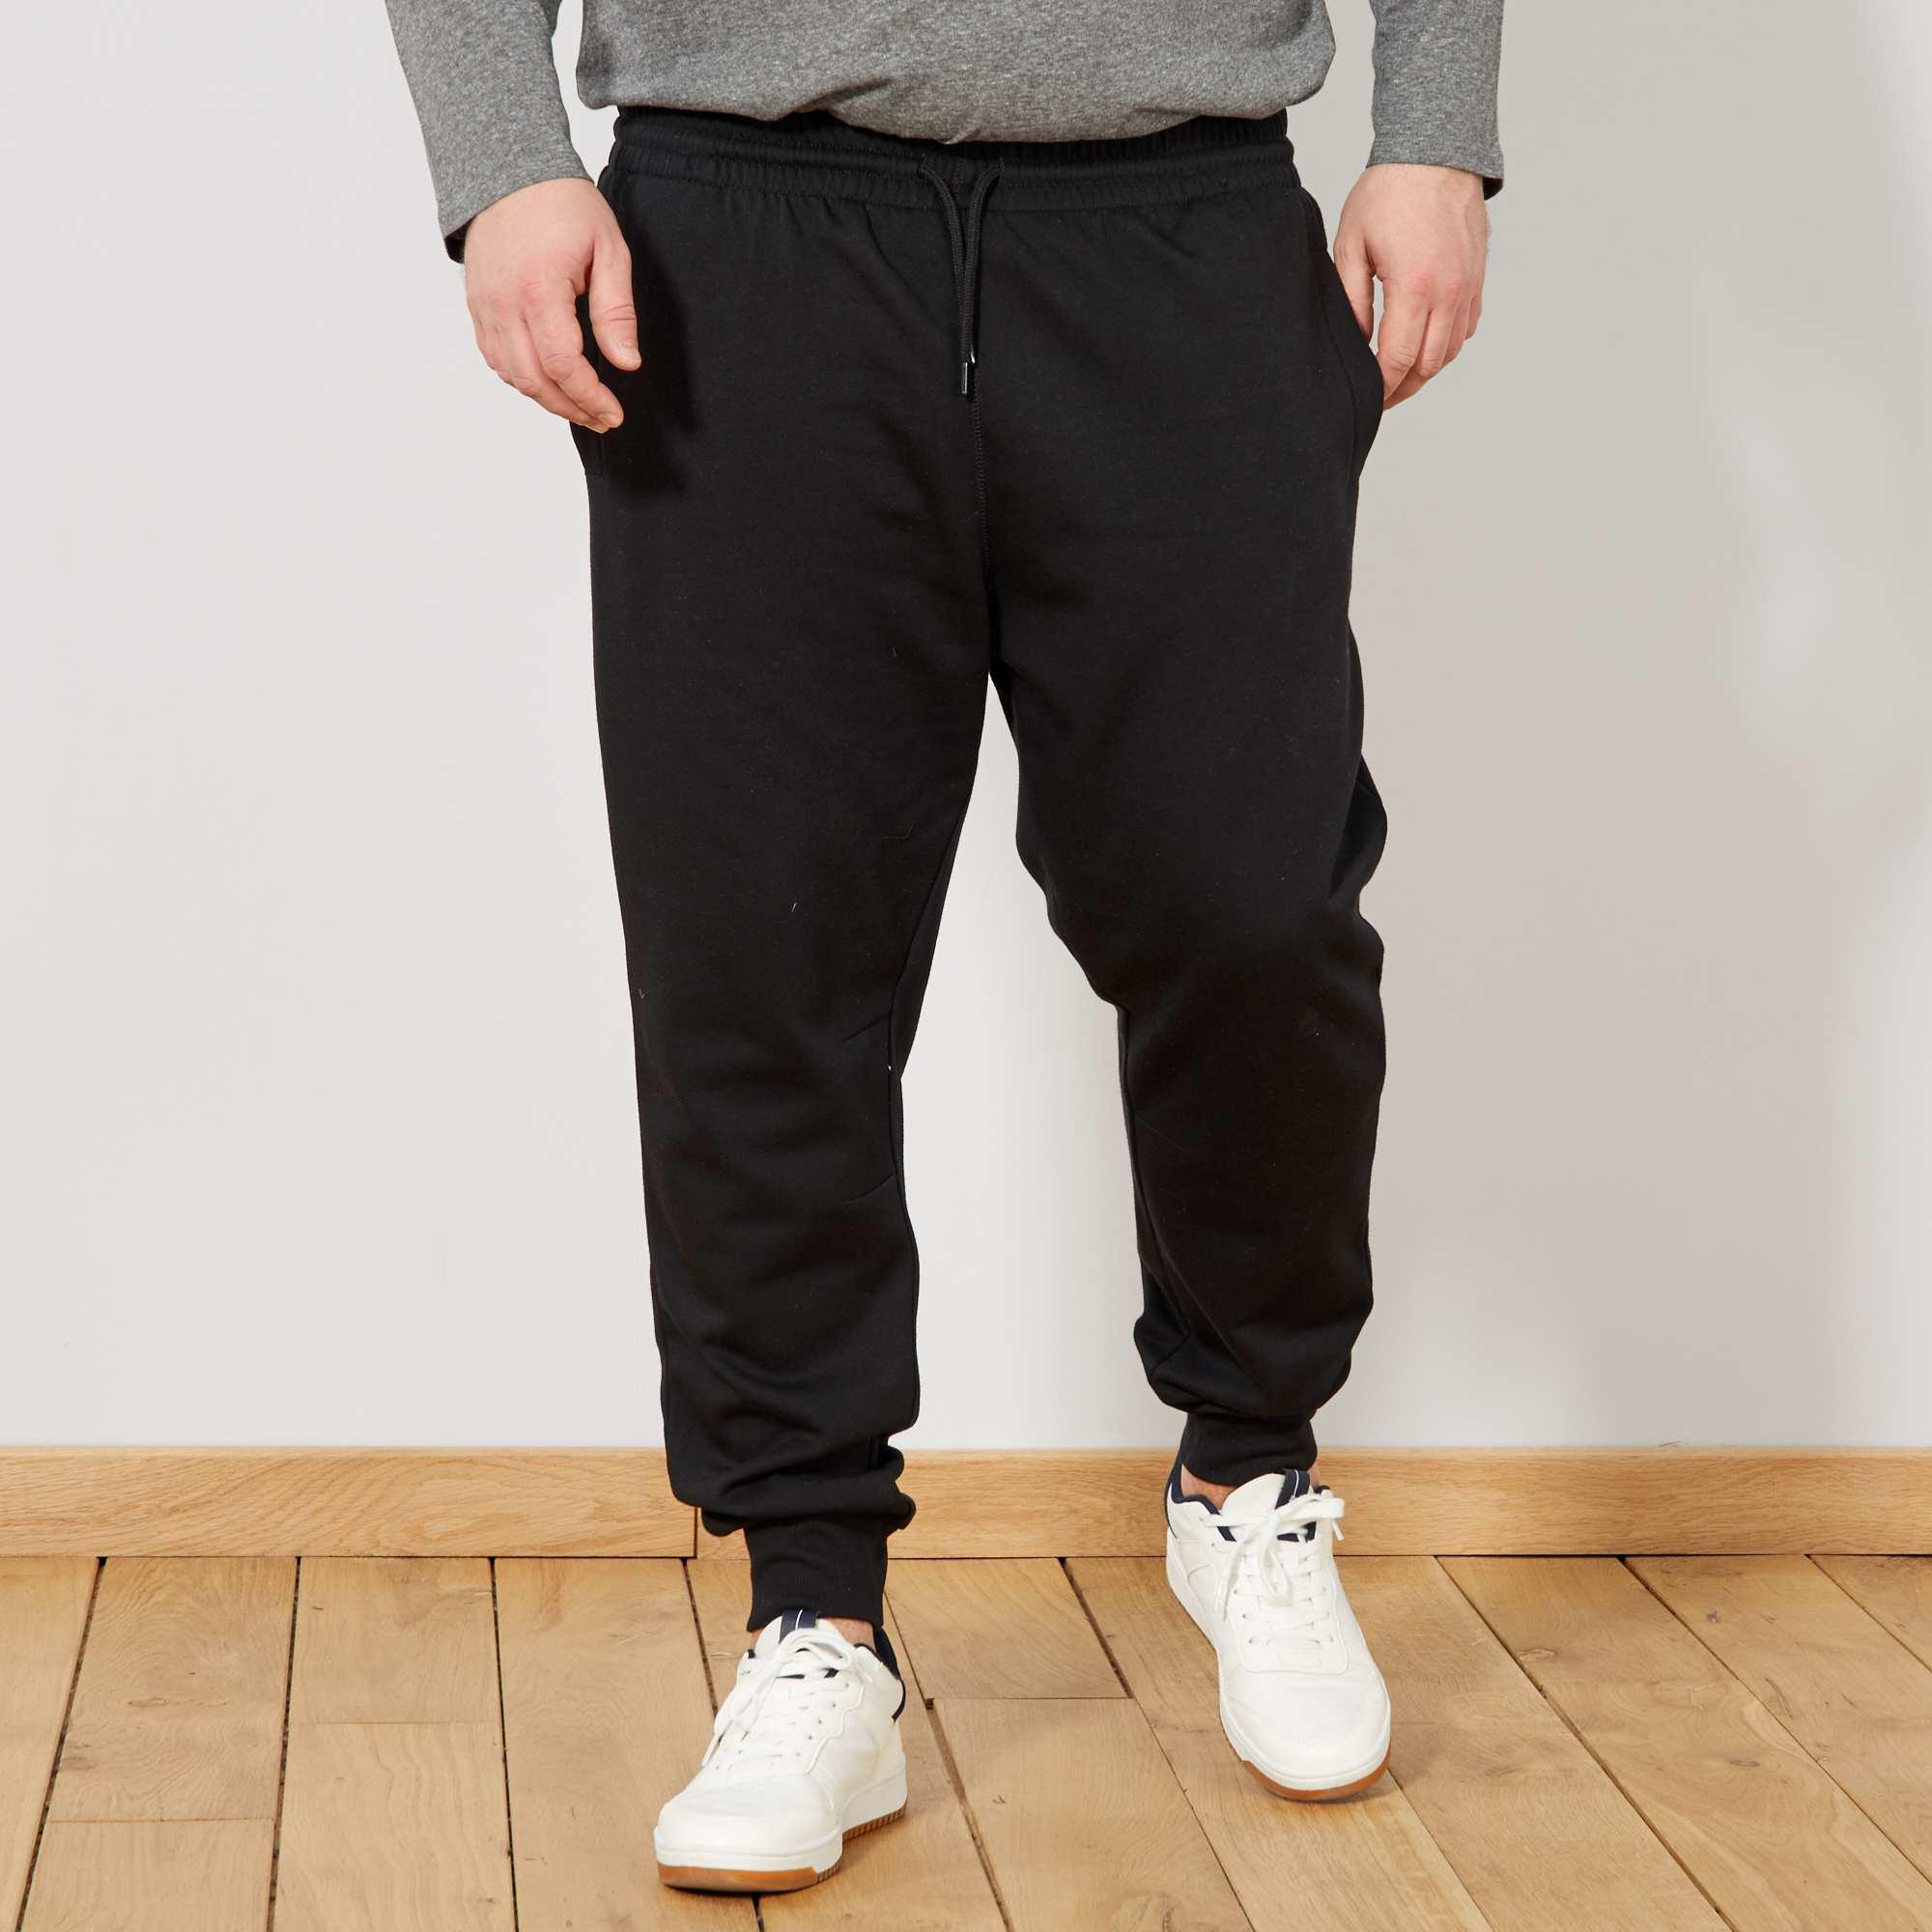 pantalon molleton grande taille homme kiabi 13 00. Black Bedroom Furniture Sets. Home Design Ideas